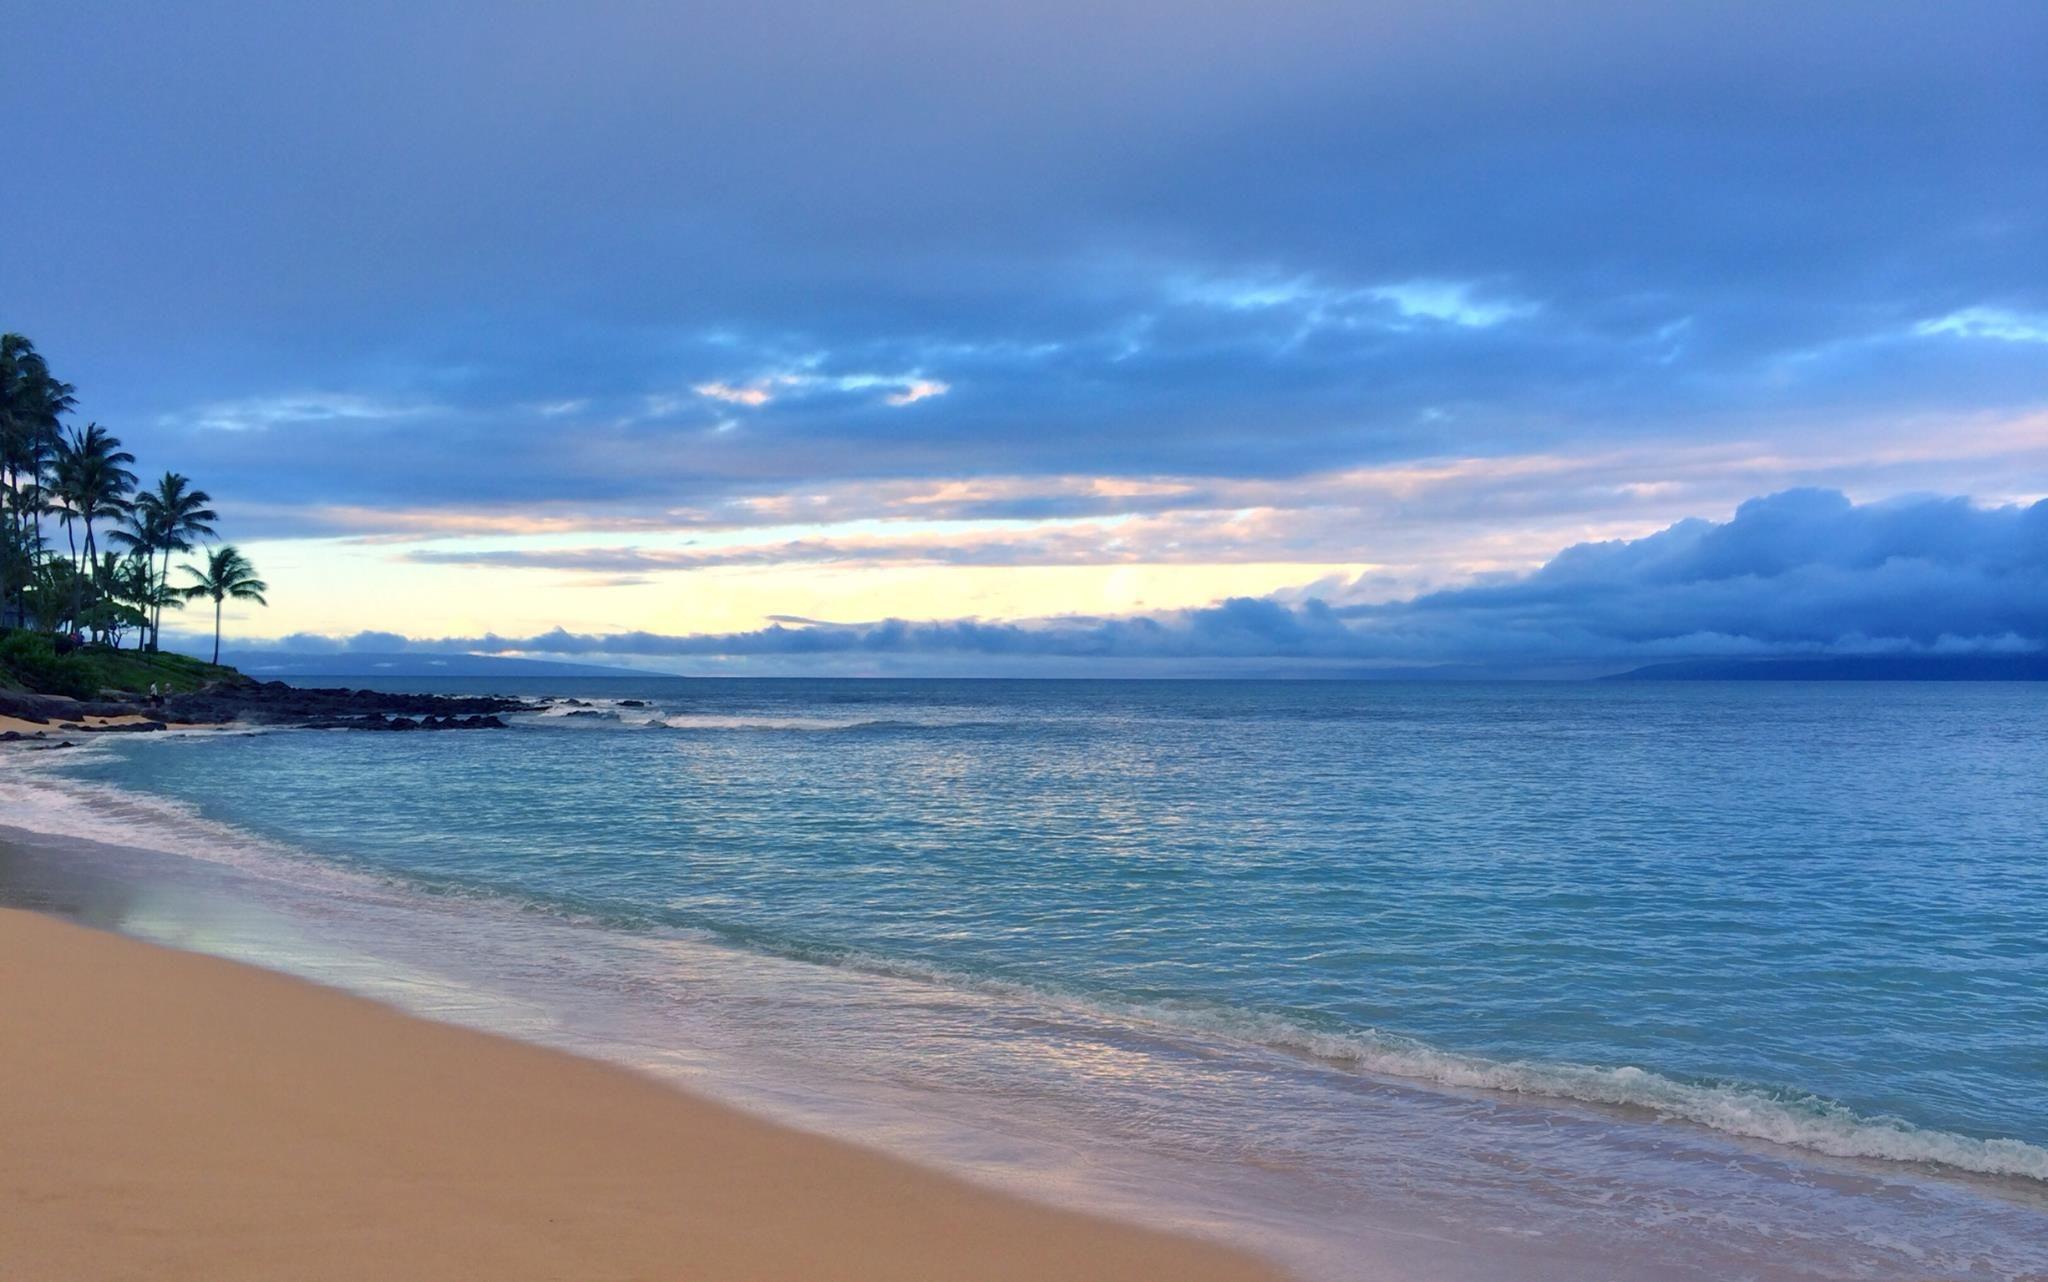 Napili Bay Maui, by Toby Neal